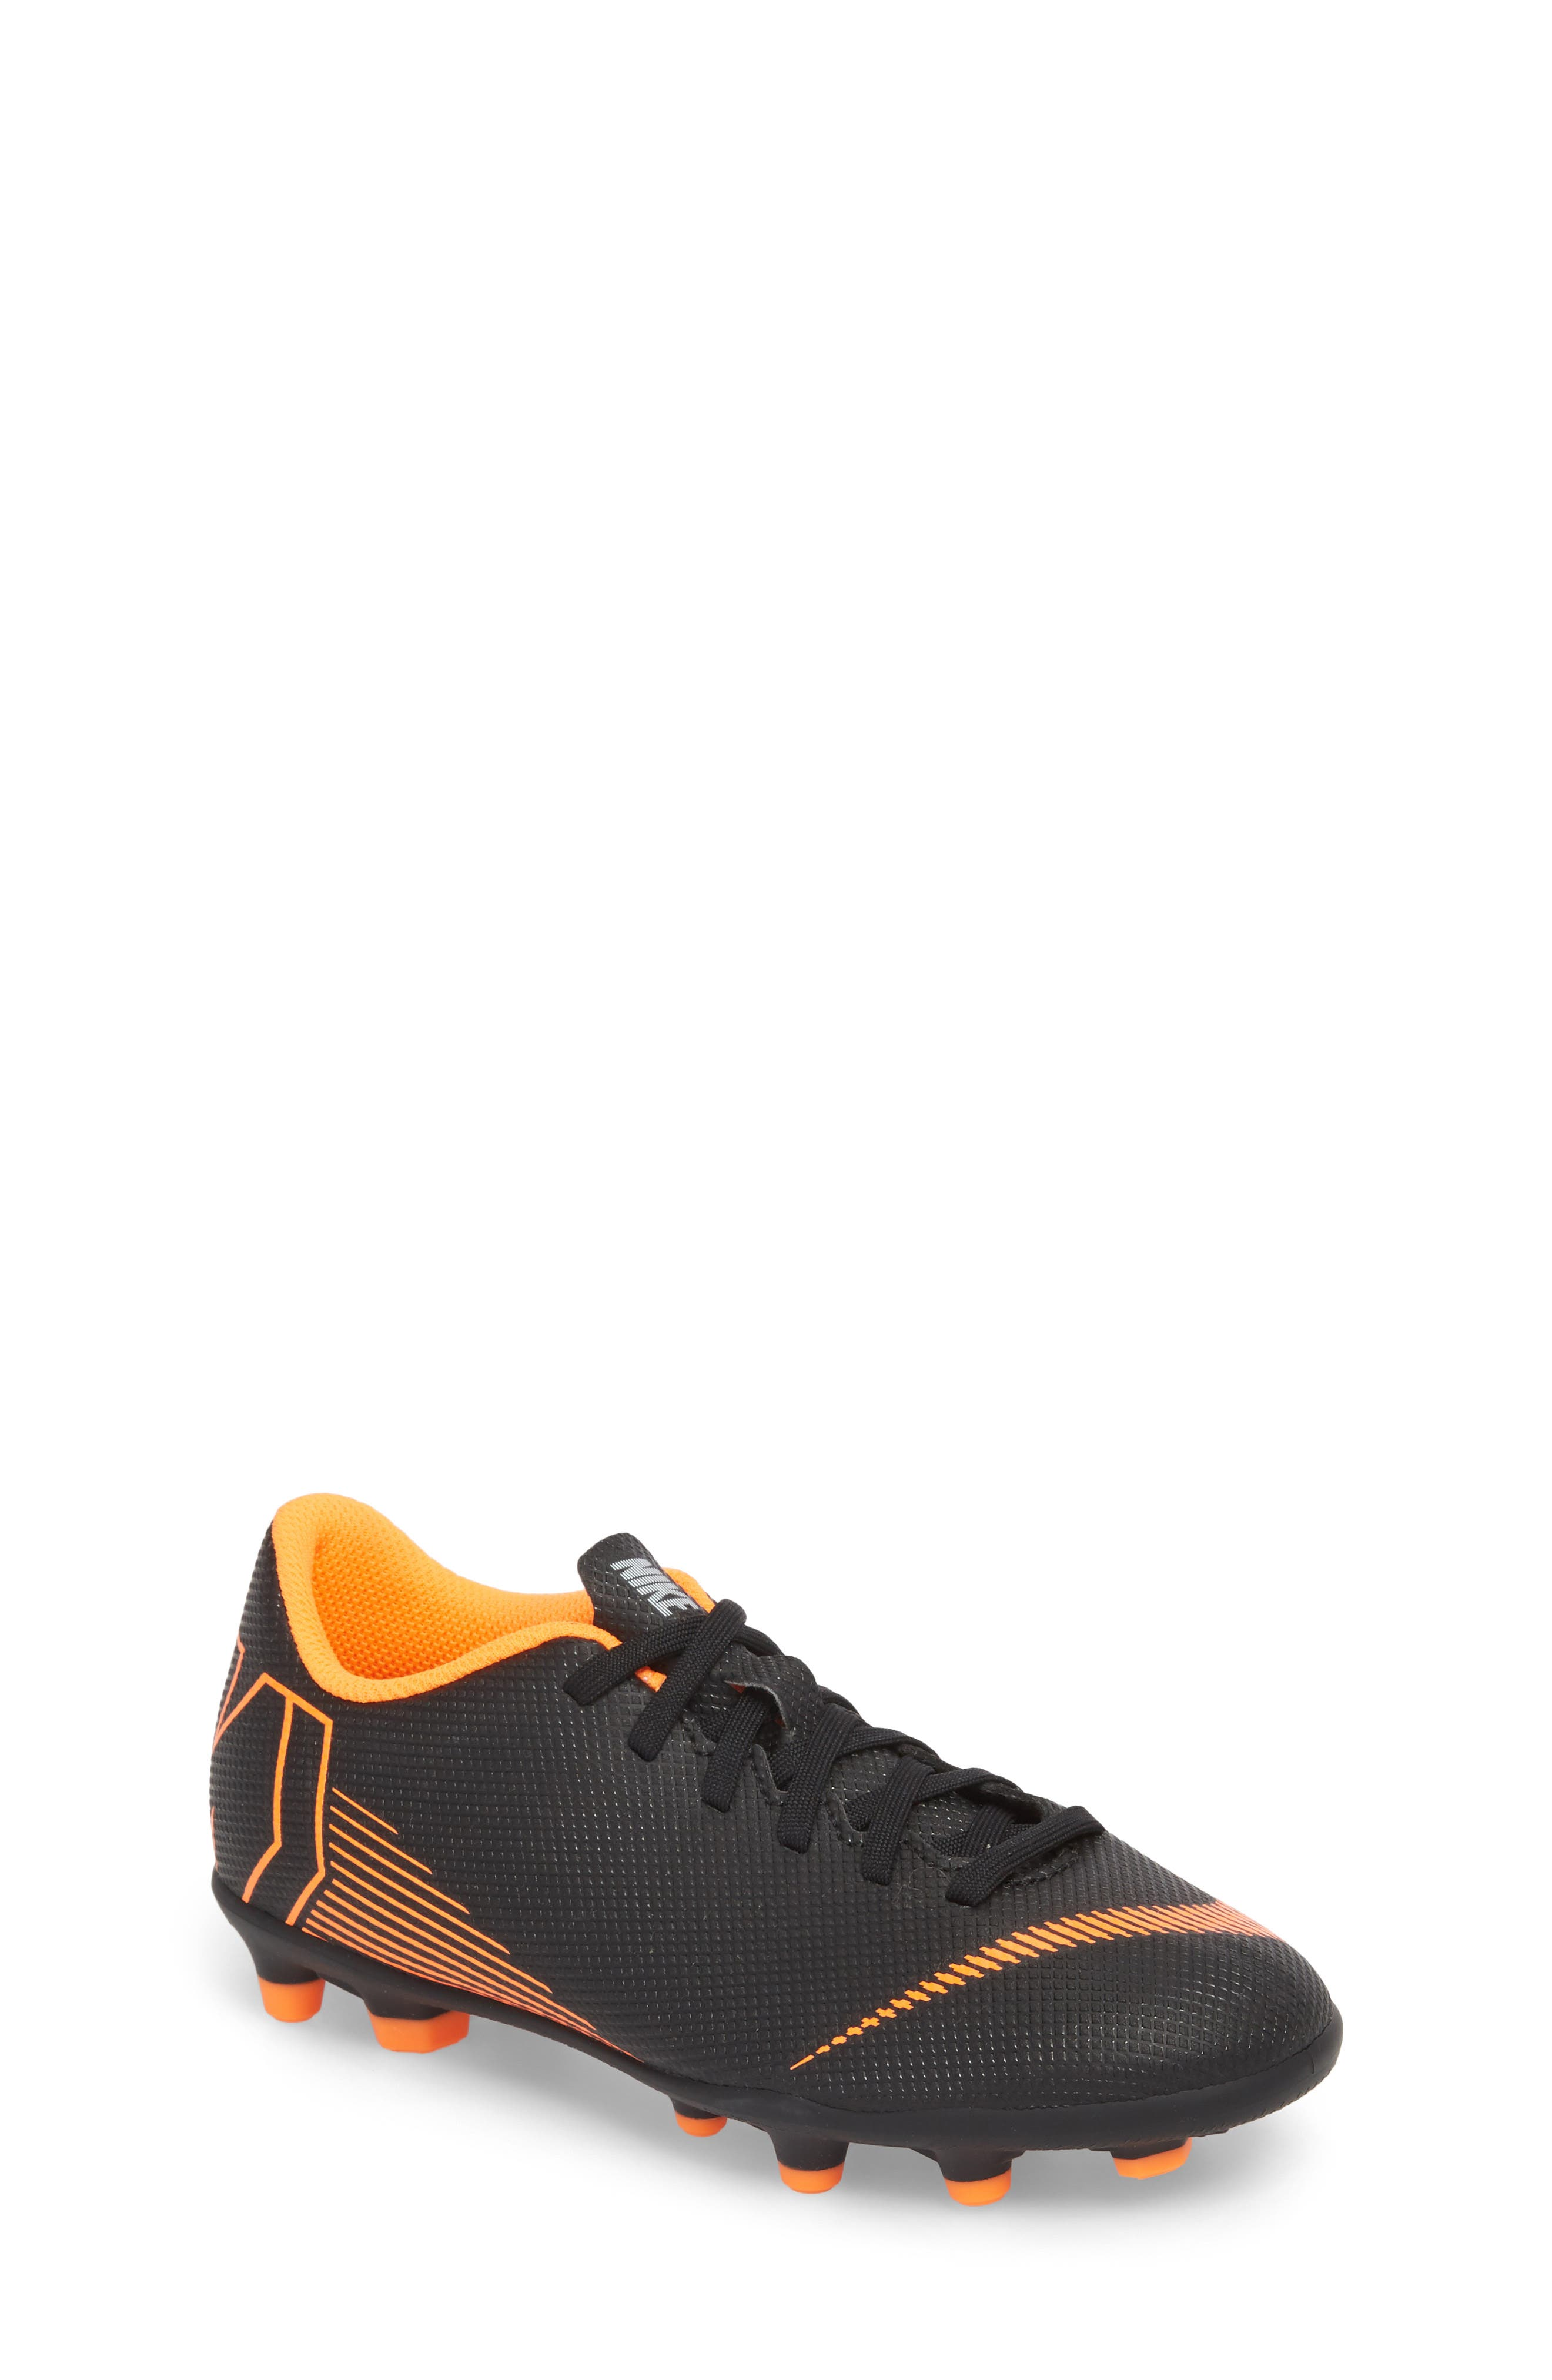 Vapor XII Club Multi Ground Soccer Shoe,                             Main thumbnail 1, color,                             Black/ Total Orange/ White